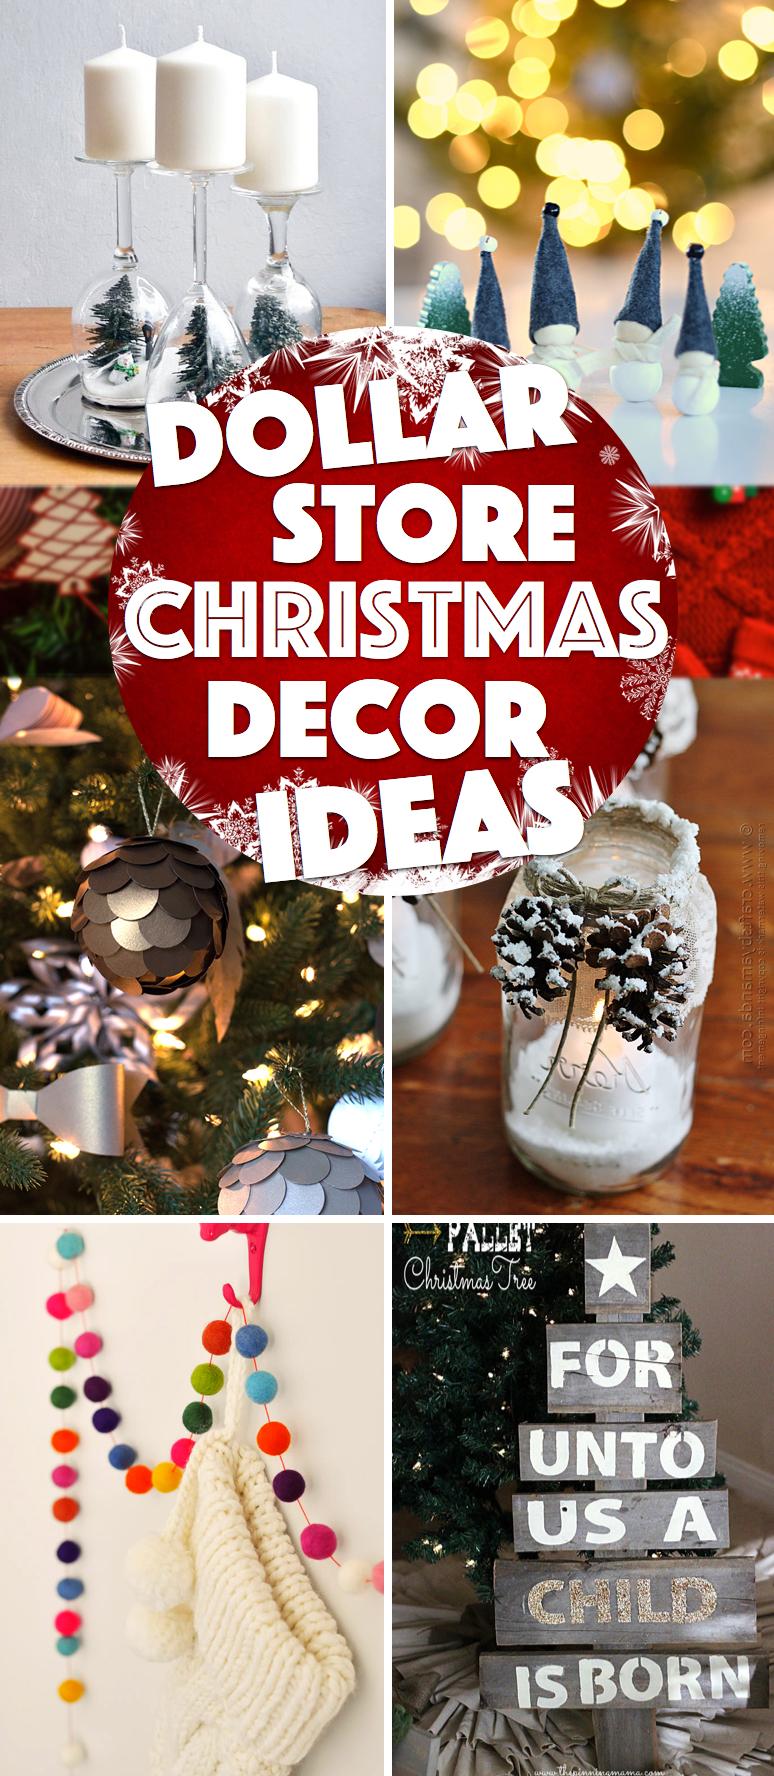 39 Oh So Gorgeous Dollar Store Diy Christmas Decor Ideas To